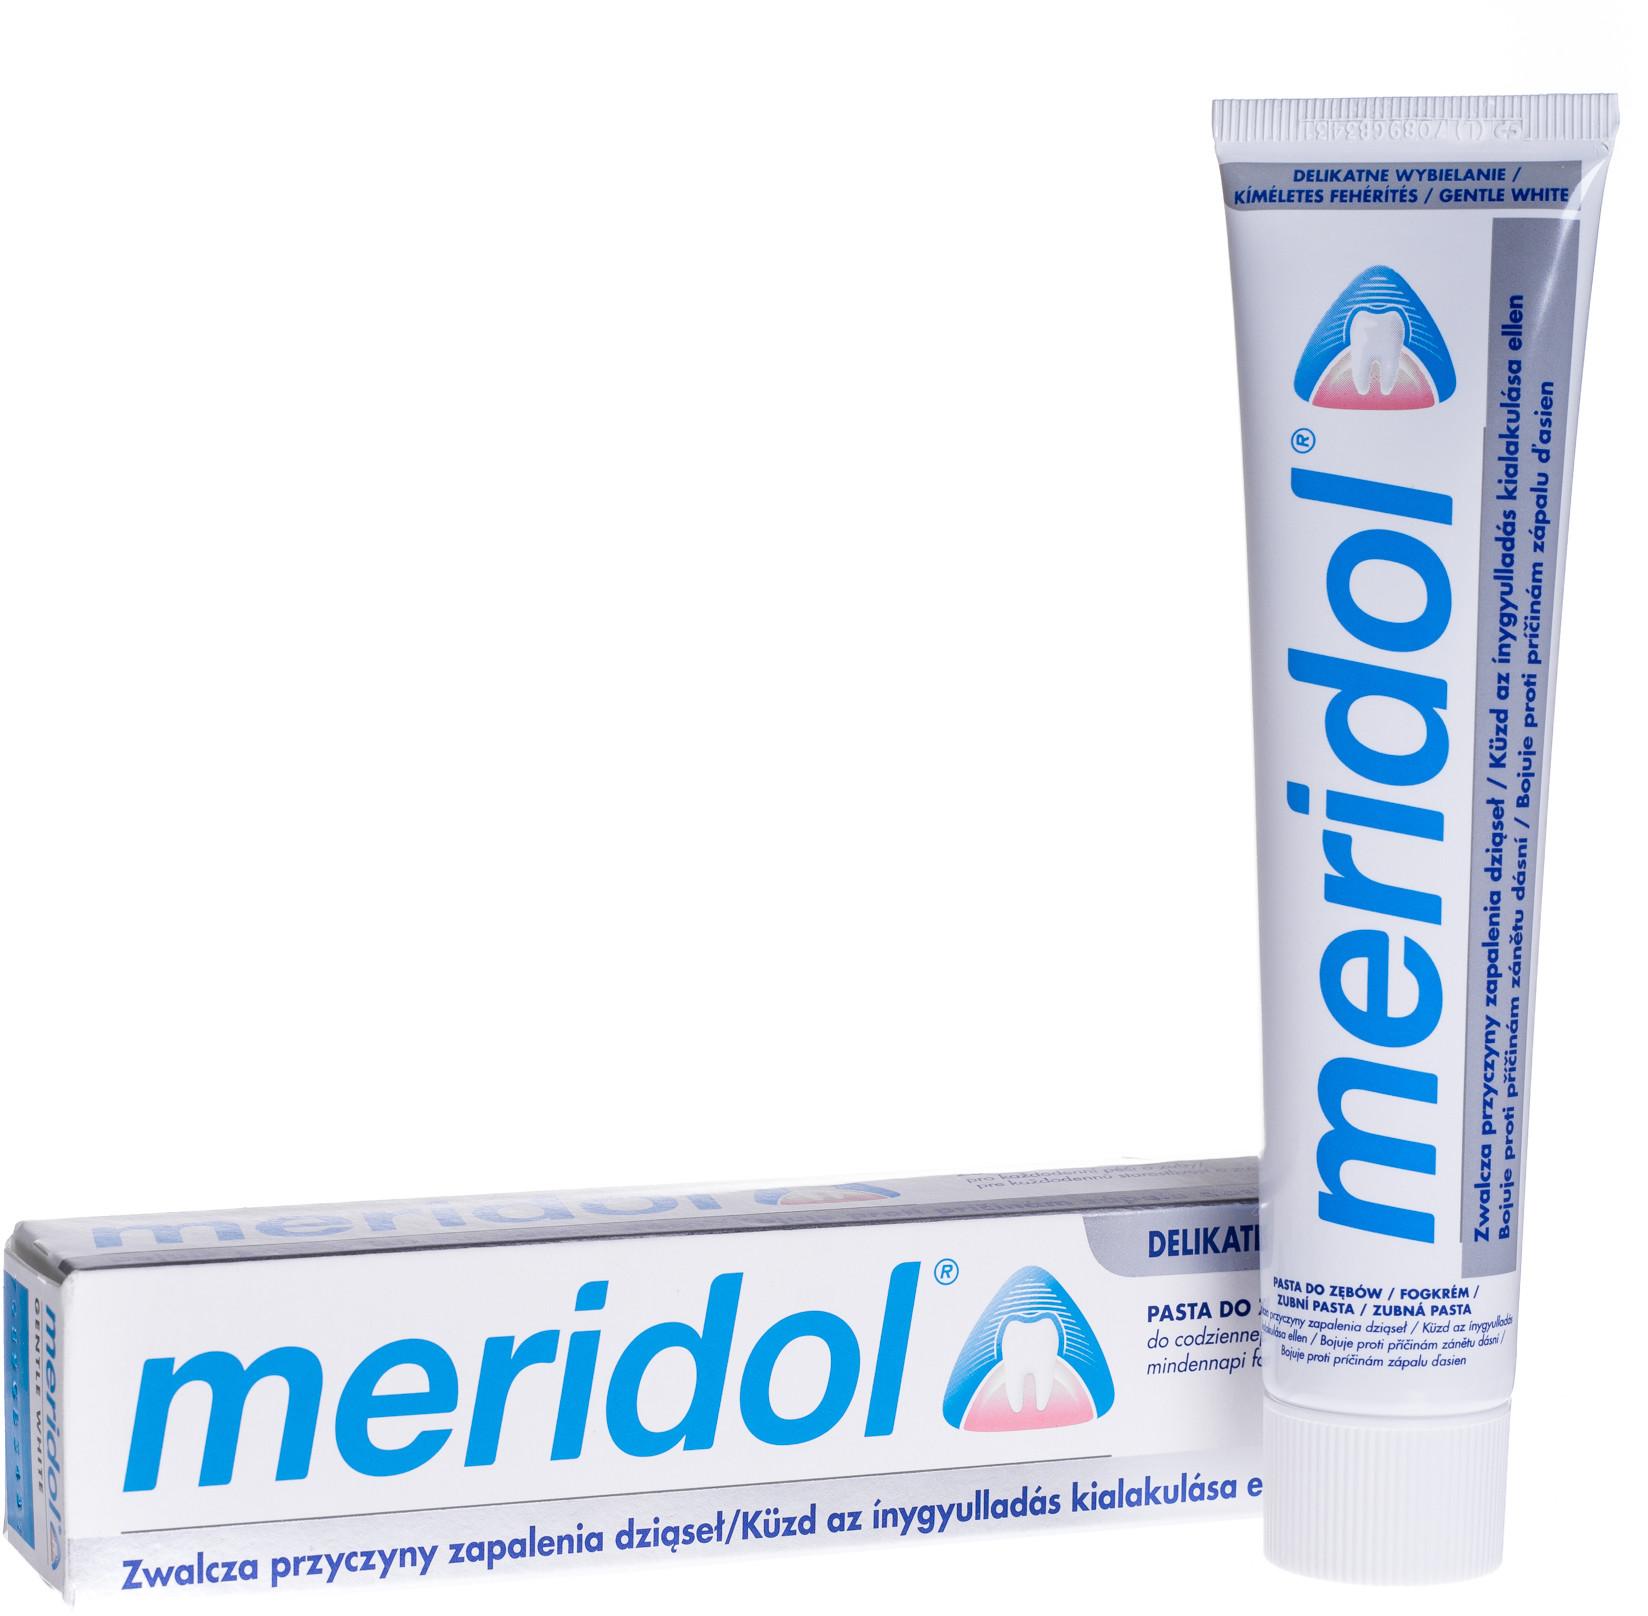 Meridol MERIDOL Pasta do Zębów Gentle White 75ml